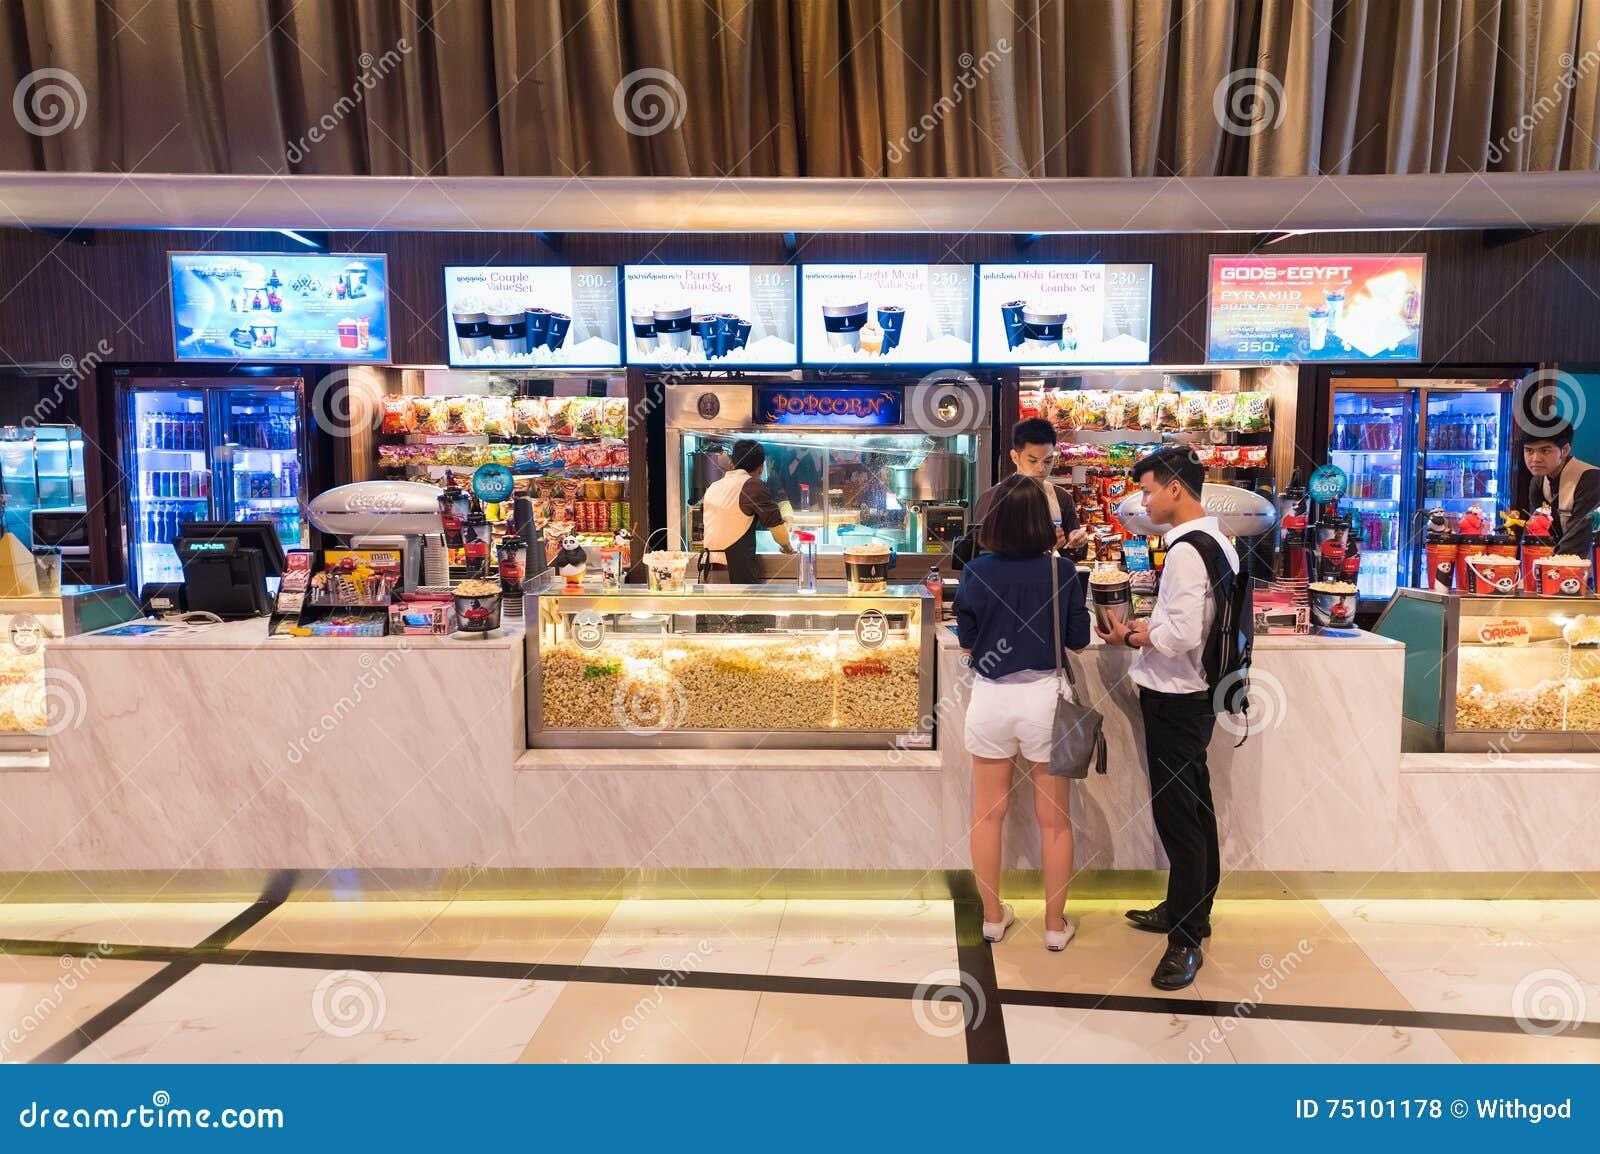 cinema snack bar paragon cineplex bangkok editorial stock photo image of entertainment mall. Black Bedroom Furniture Sets. Home Design Ideas